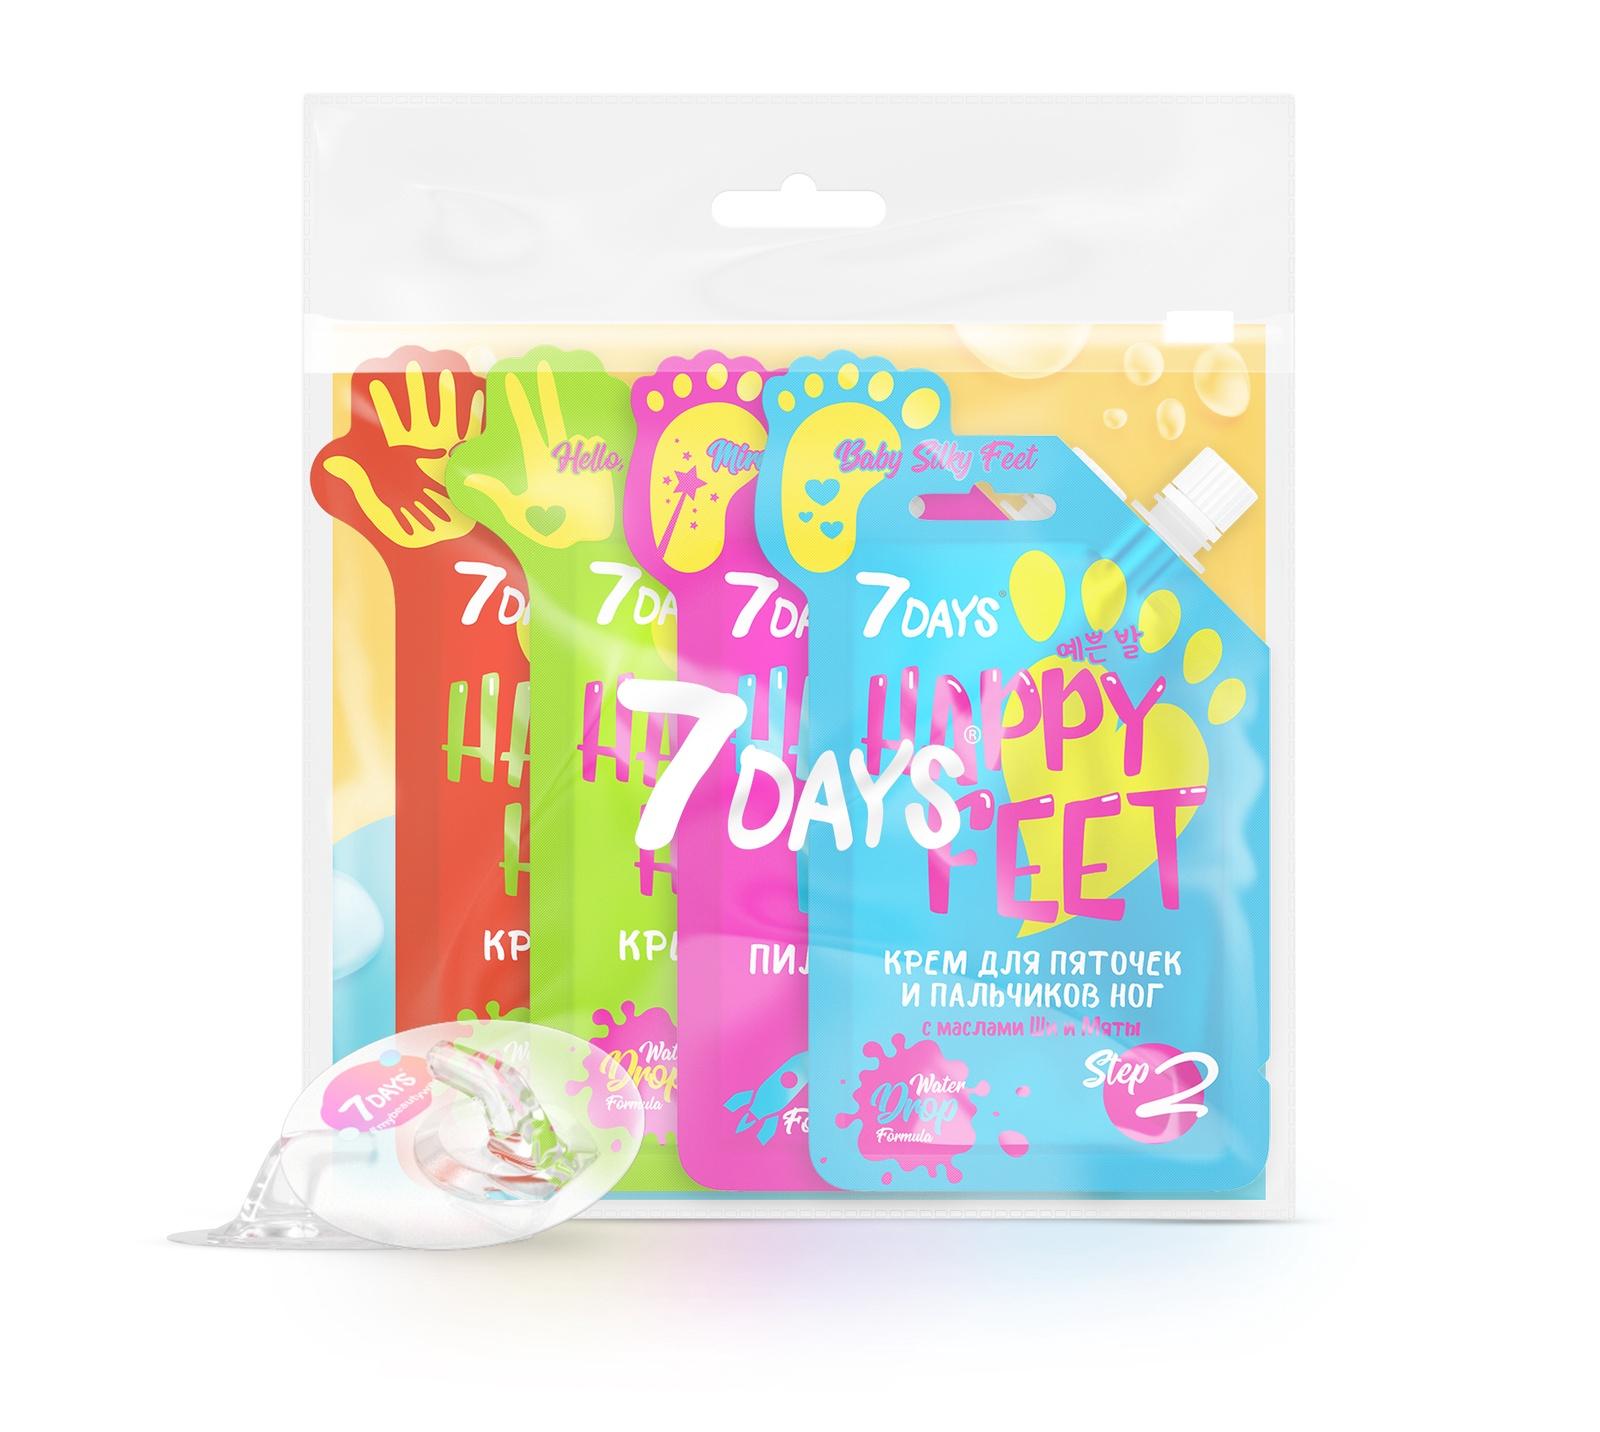 Набор косметики для ухода за кожей 7 Days Beauty Bag Руконоженька